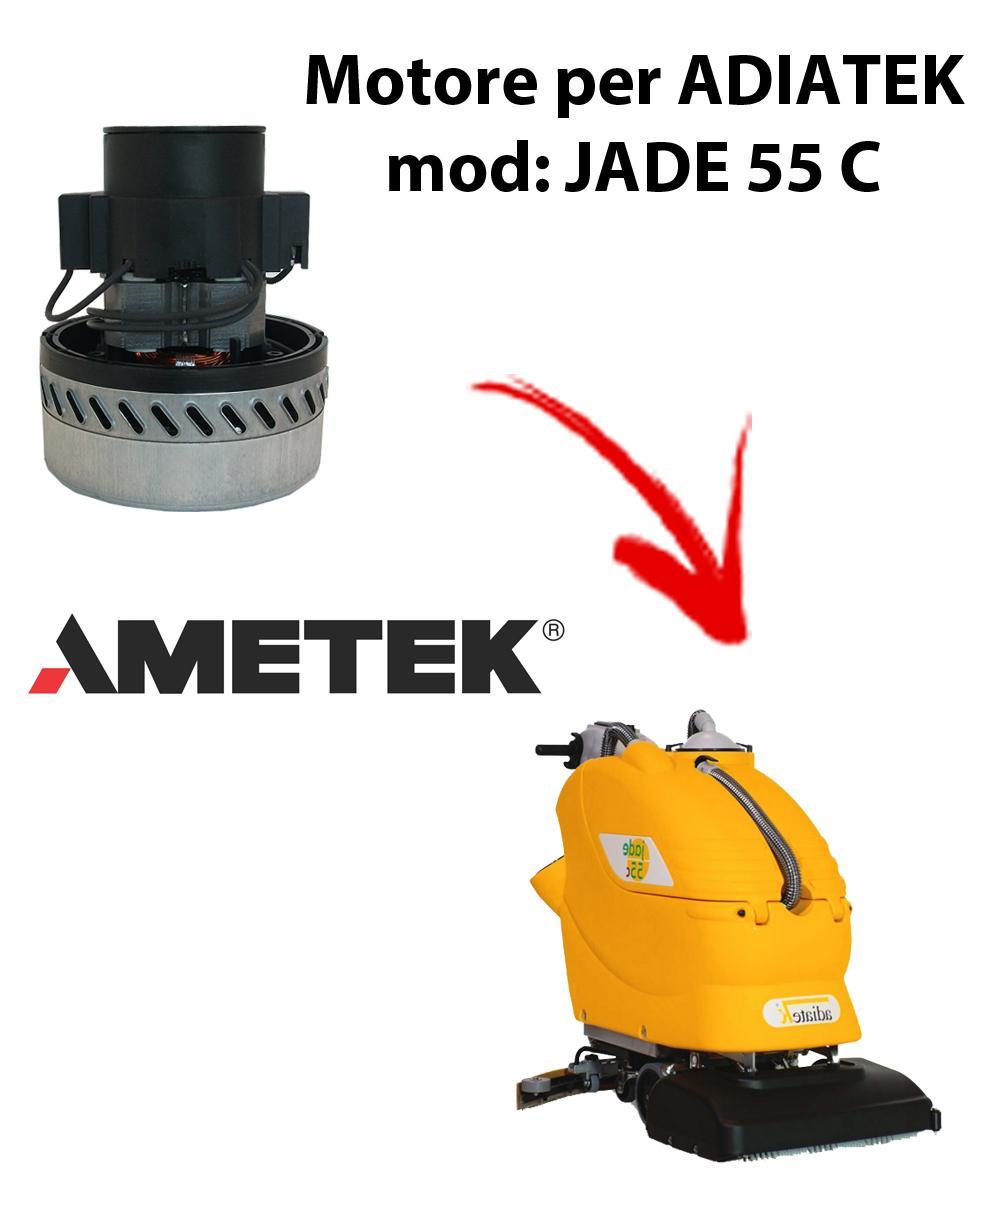 JADE 55 C Motore aspirazione AMETEK ITALIA per lavapavimenti Adiatek